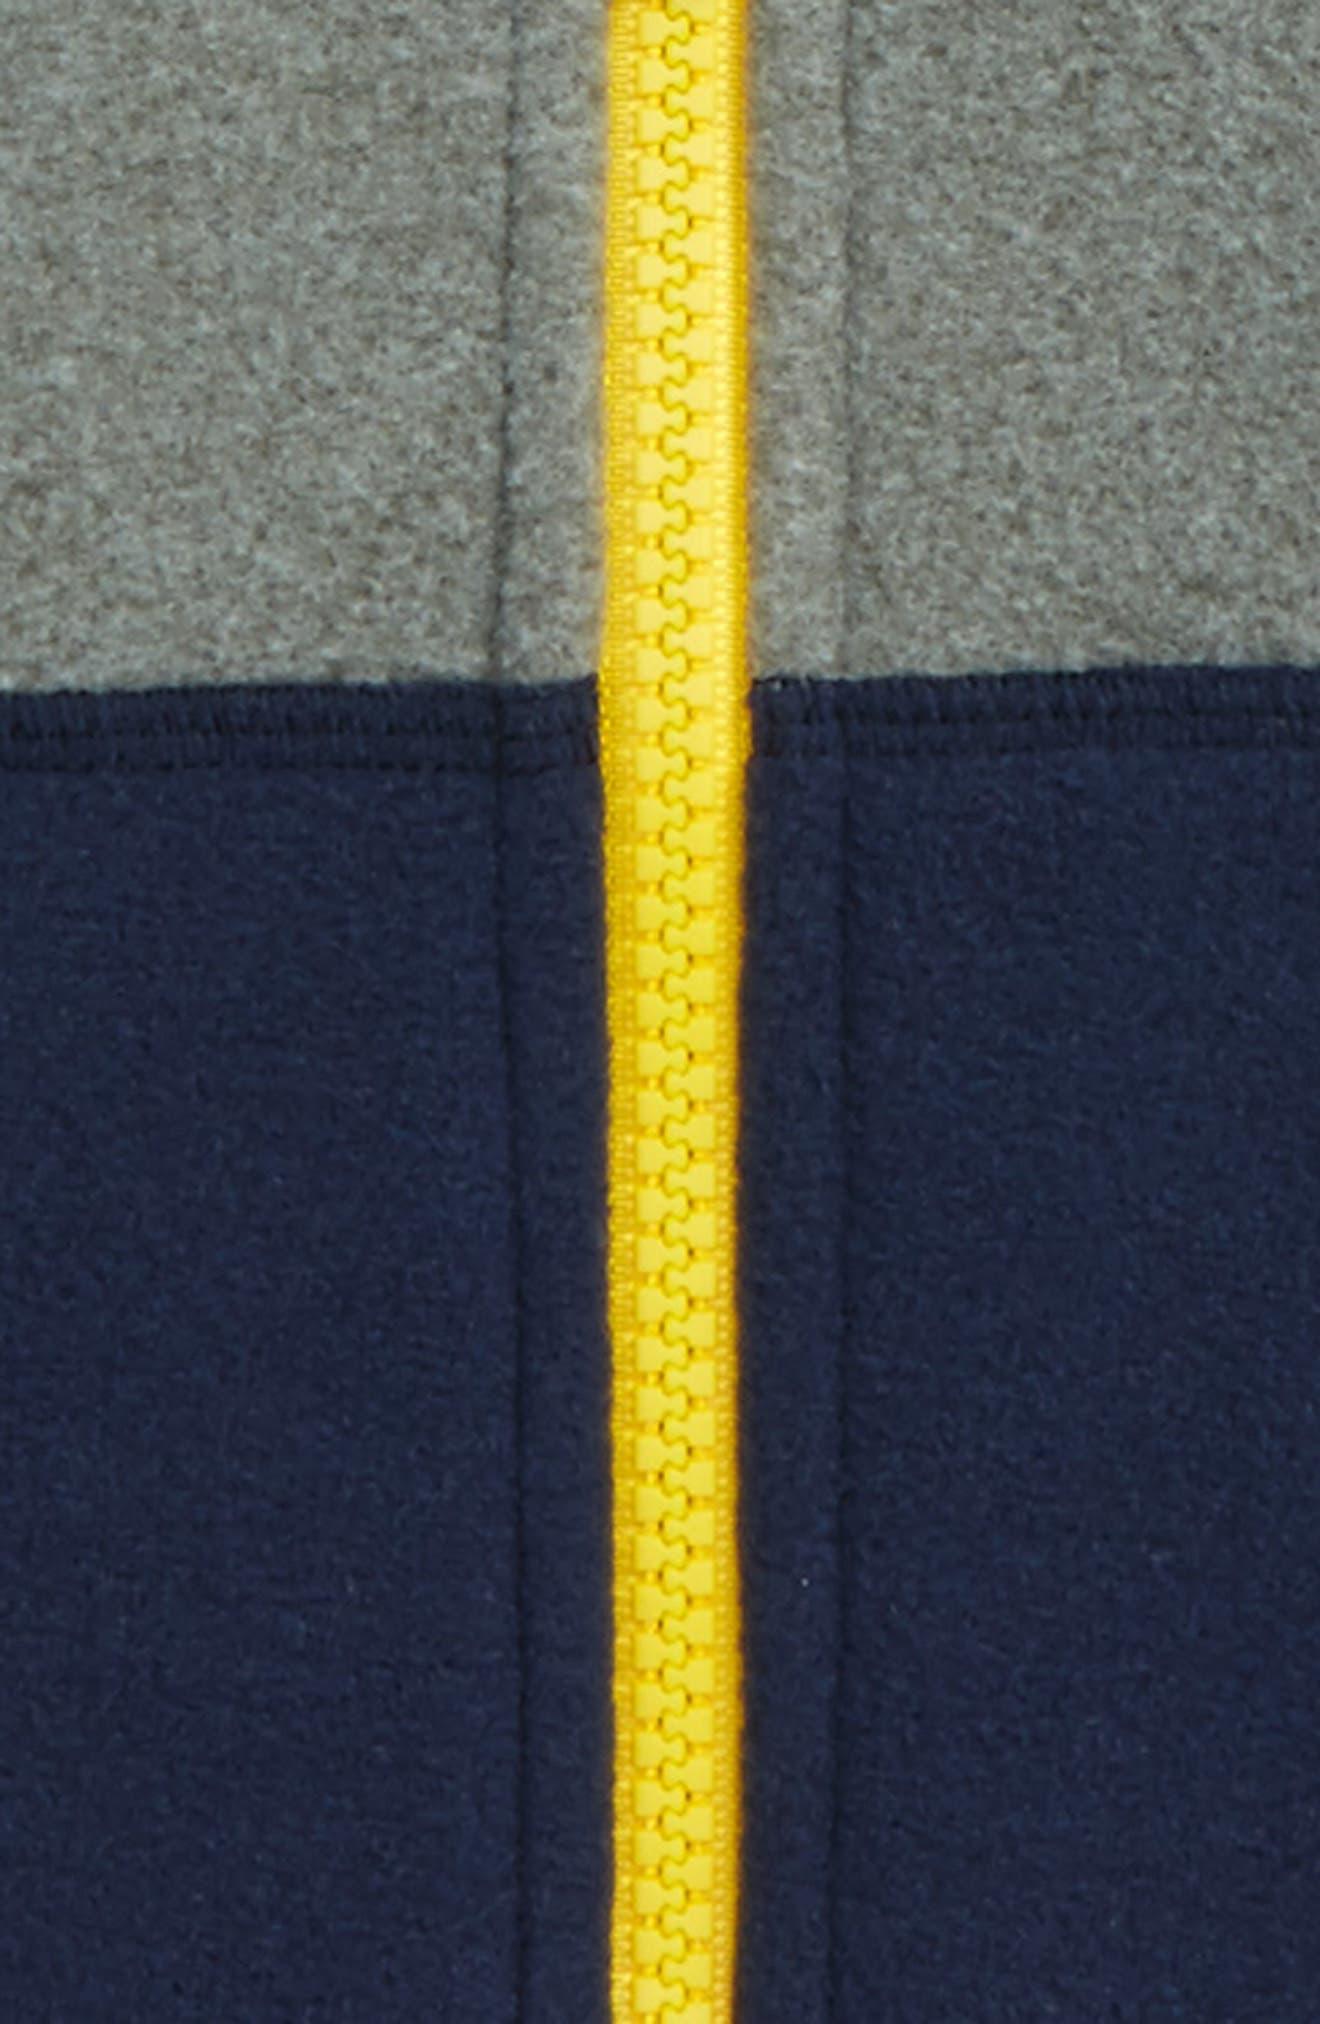 'Glacier' Zip Hoodie,                             Alternate thumbnail 2, color,                             Tnf Medium Grey/ Cosmic Blue